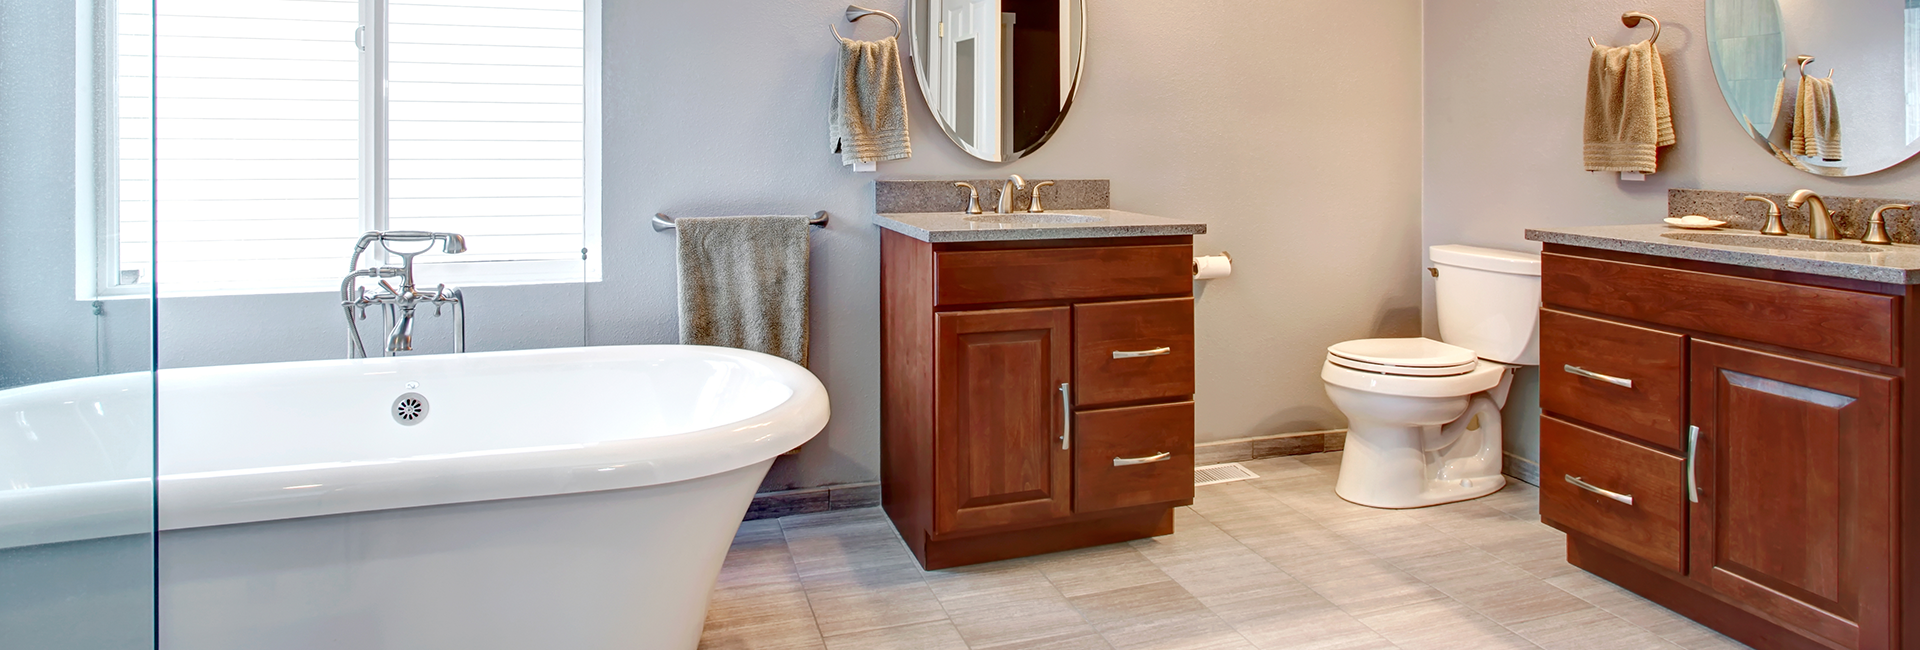 Bathroom renovations hamilton - Hamilton Bathroom Renovations